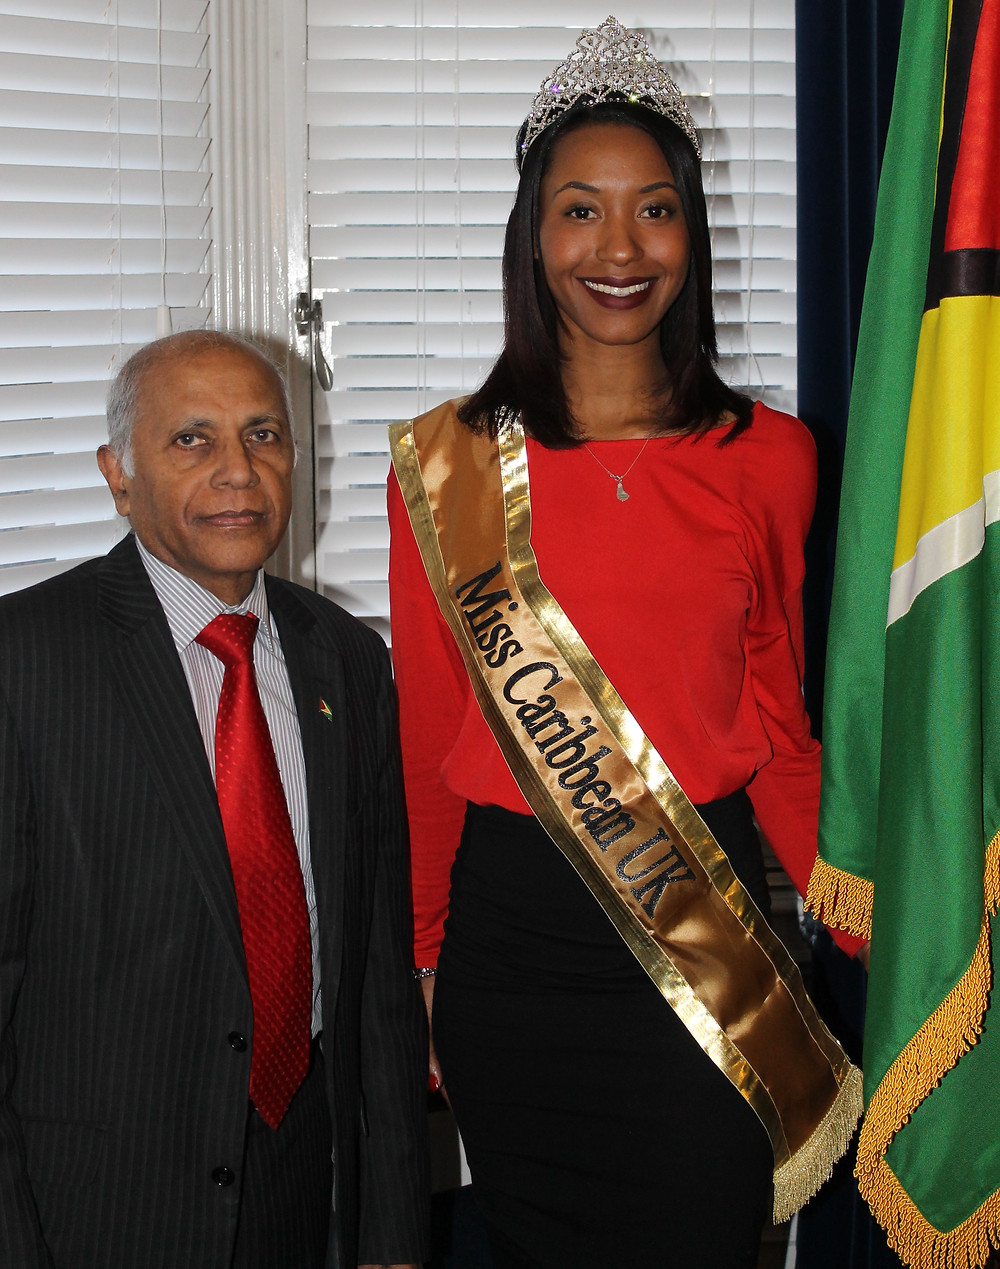 His Excellency  L. K. N. Singh Guyana High Commissioner &  Miss Caribbean, Miss